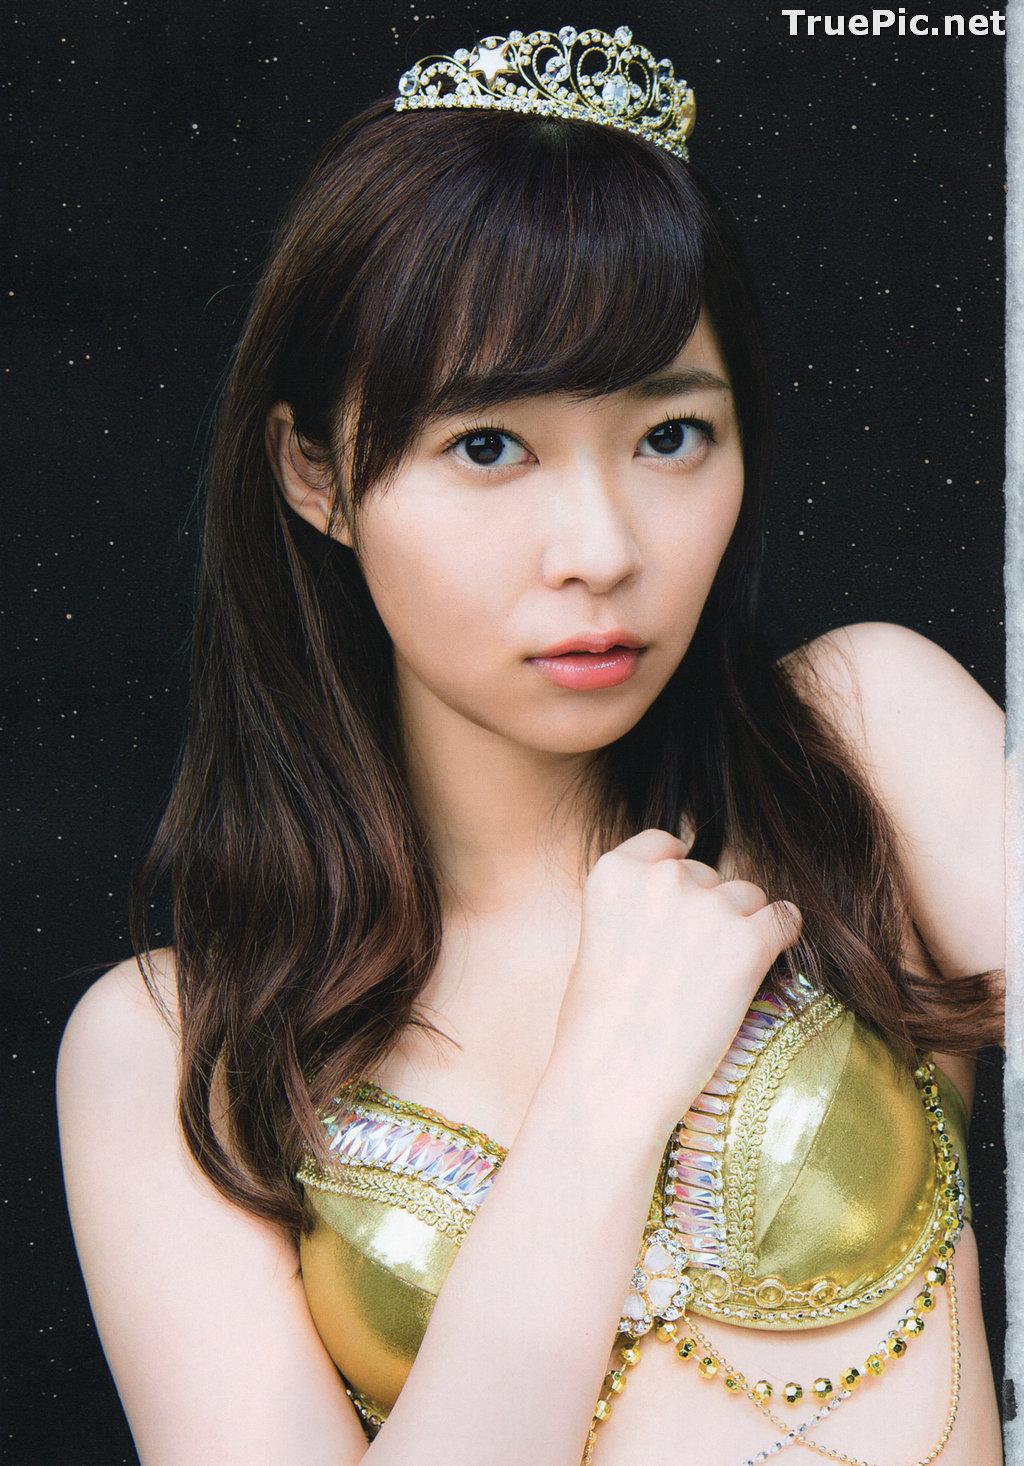 Image AKB48 General Election! Swimsuit Surprise Announcement 2016 - TruePic.net - Picture-3